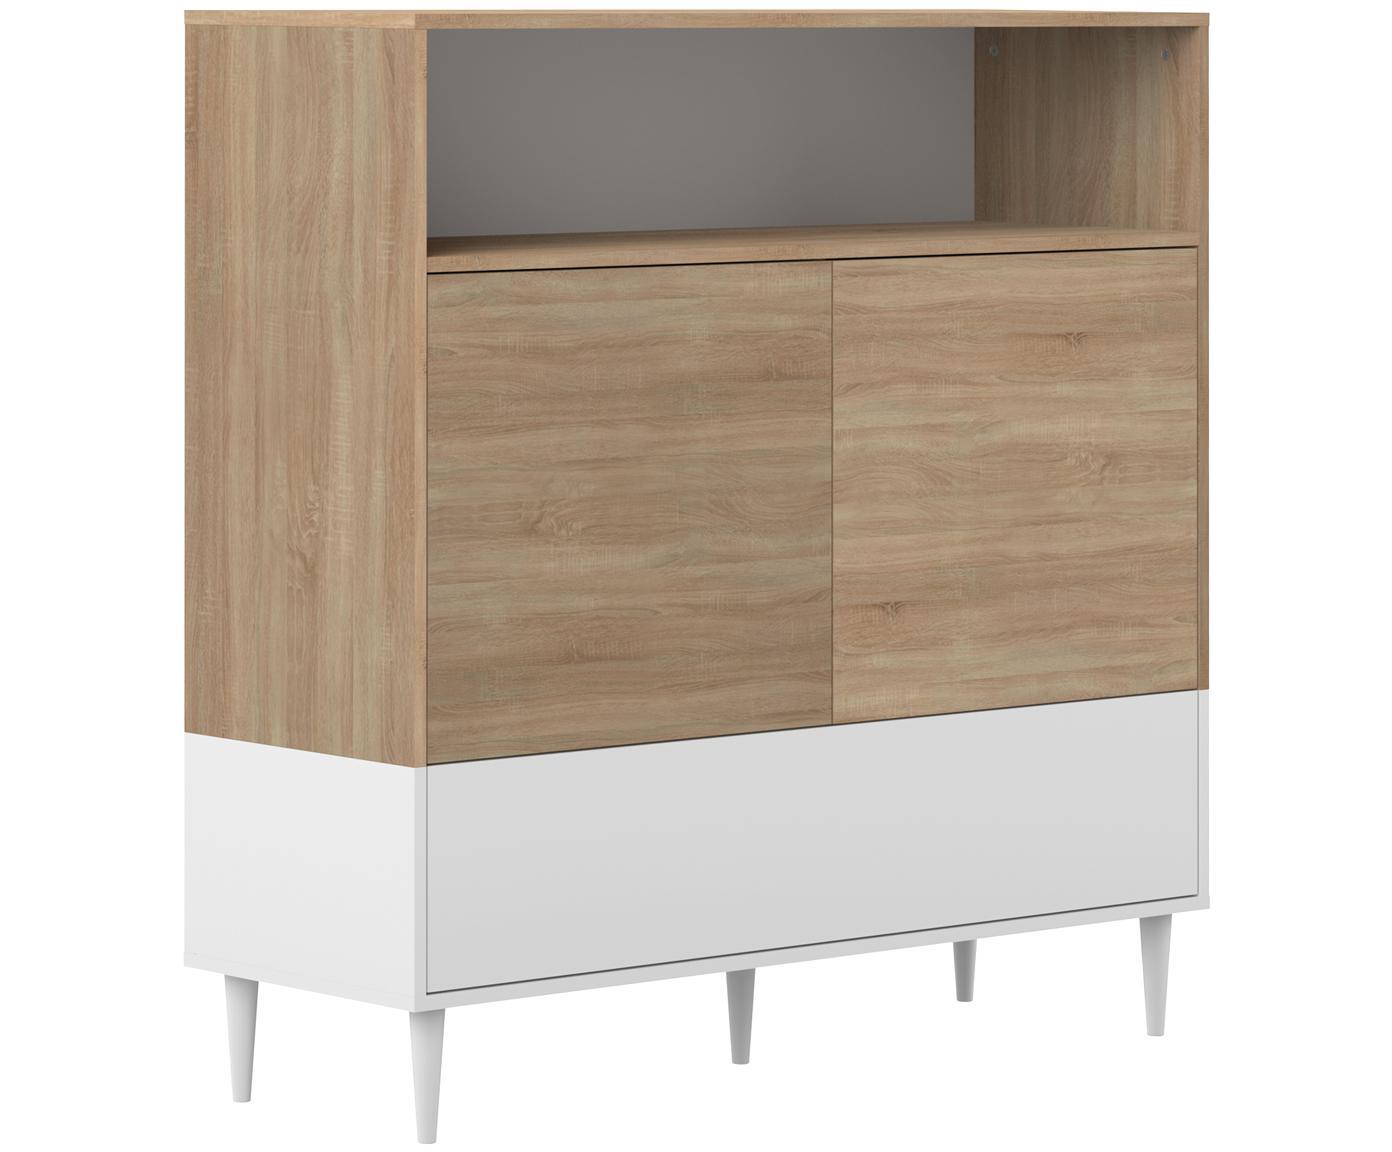 Highboard Horizon im Skandi Design, Korpus: Spanplatte, melaminbeschi, Eichenholz, Weiss, 120 x 121 cm